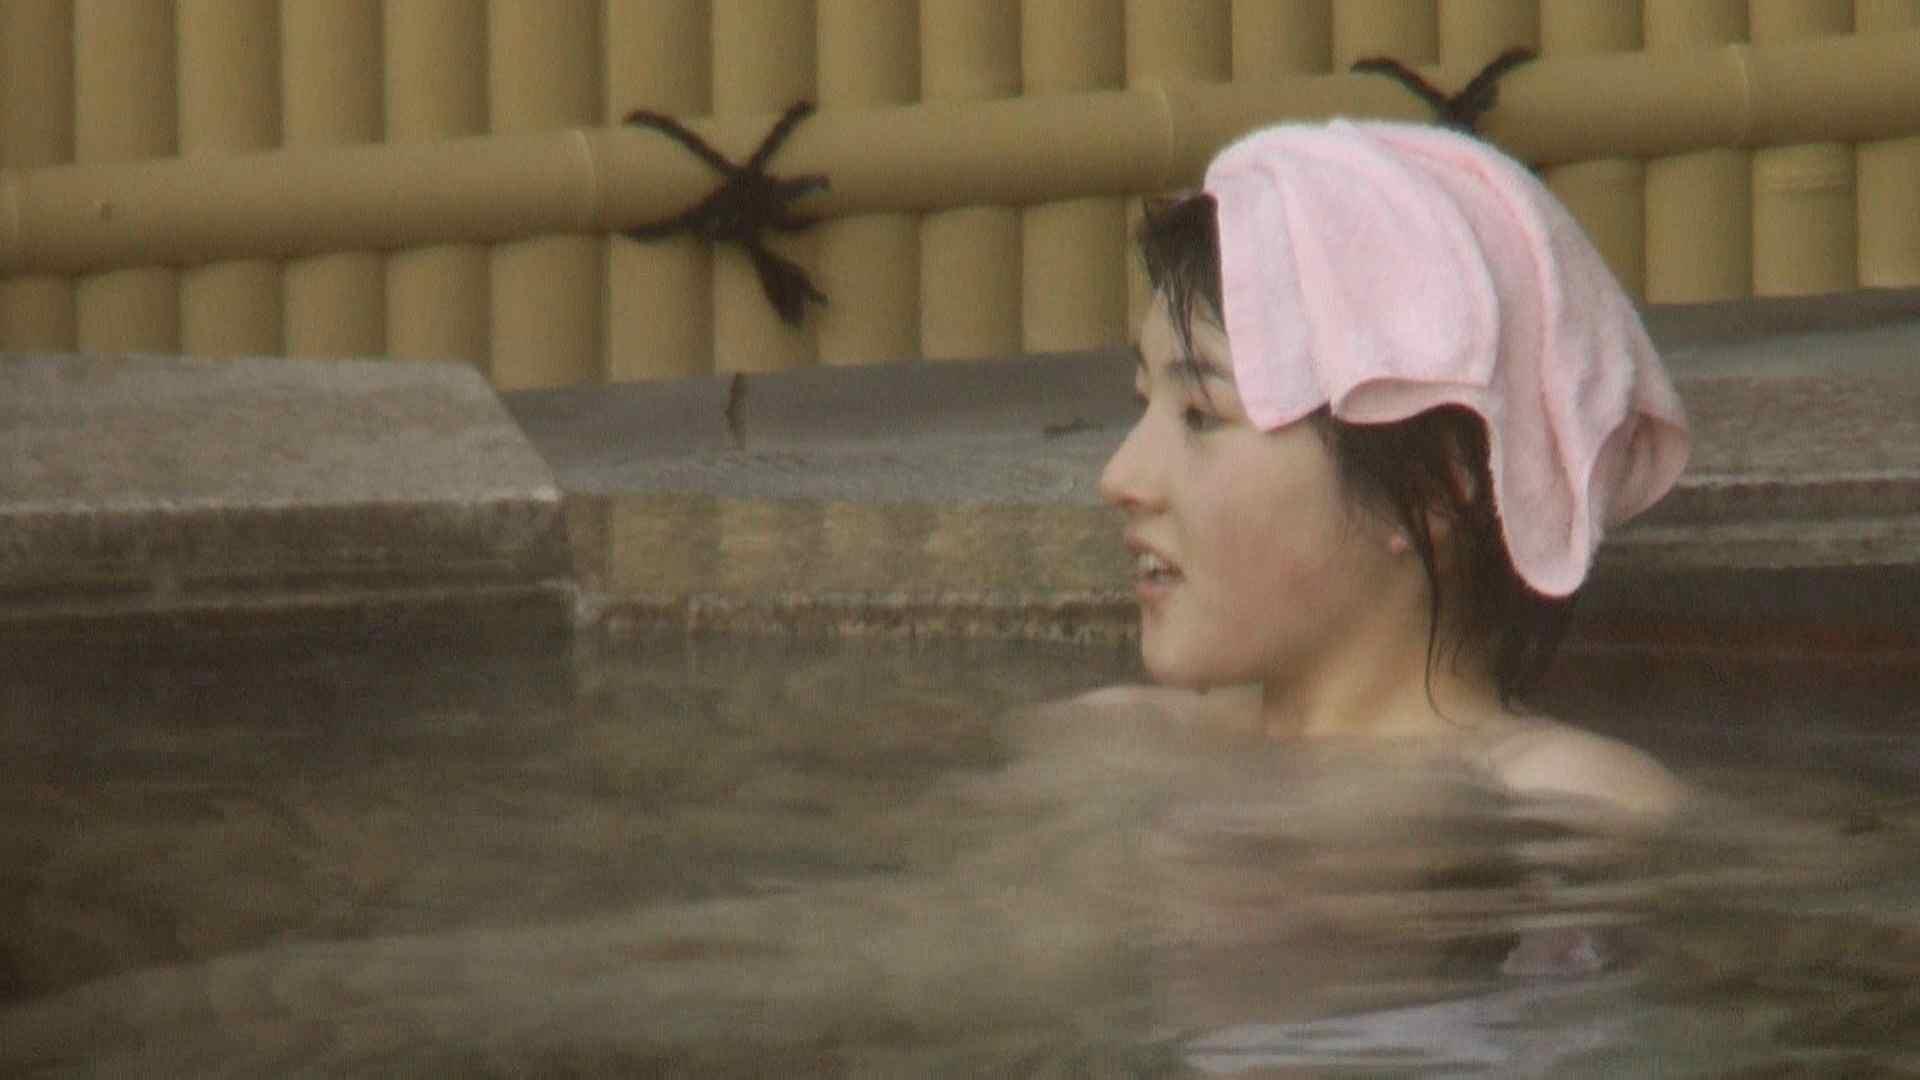 Aquaな露天風呂Vol.207 露天風呂編 | 盗撮シリーズ  109PIX 67